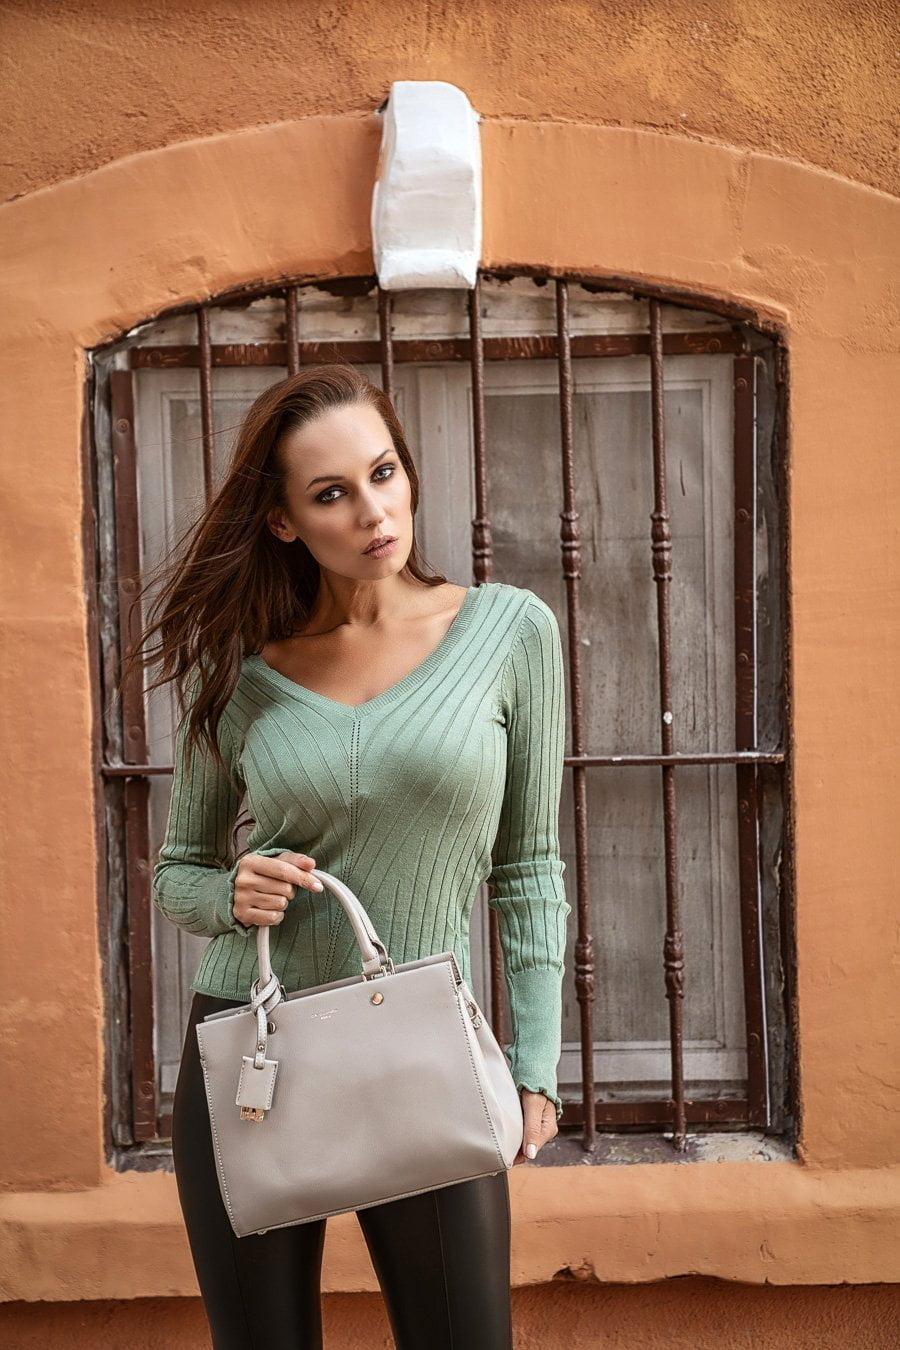 Moda Çekimi - Editorial - Beauty moda tekstil burakbulutfotografatolyesi 11